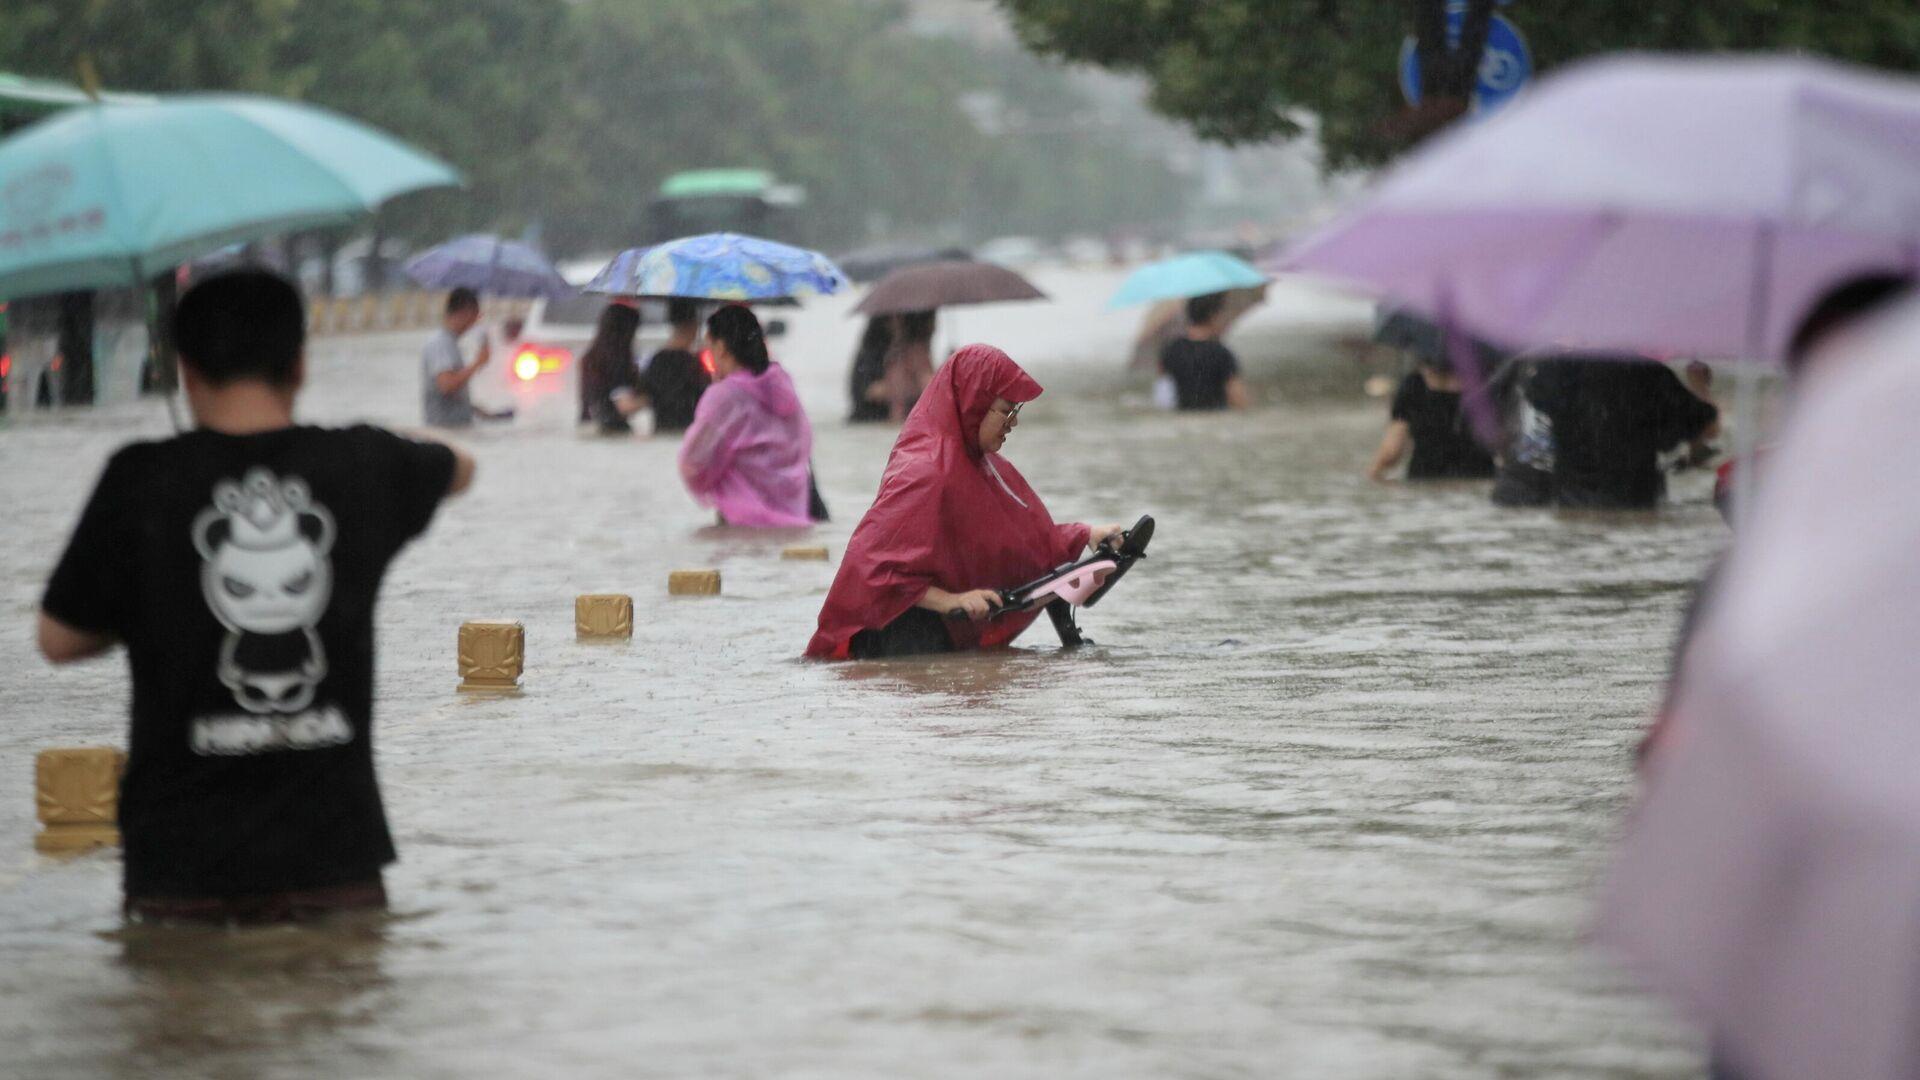 Наводнение в Чжэнчжоу, Китай - РИА Новости, 1920, 21.07.2021